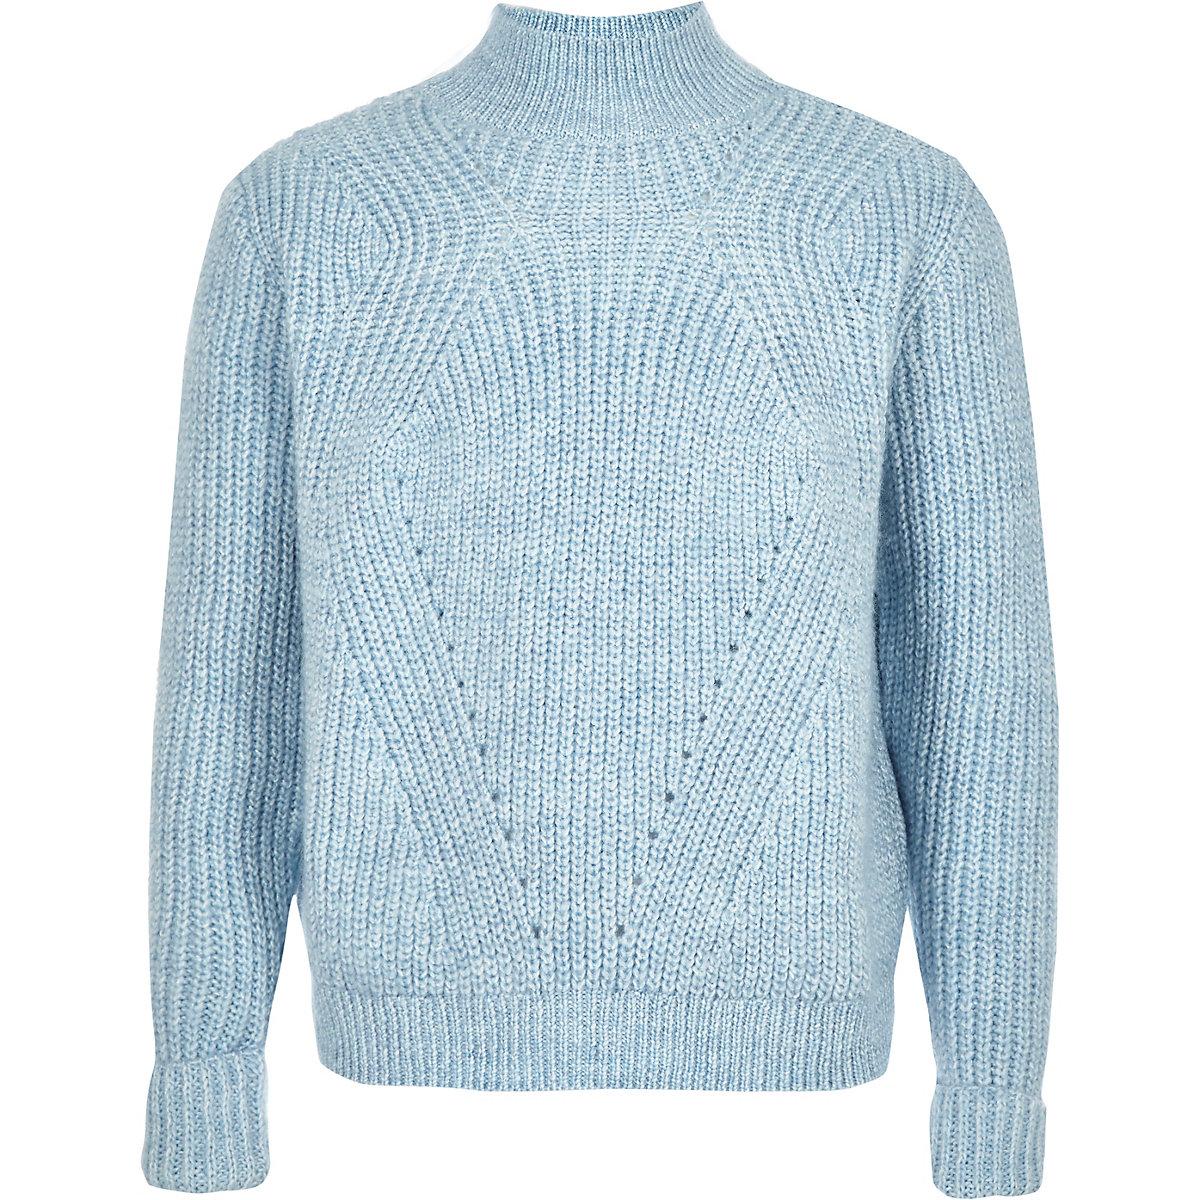 Girls blue roll neck knit sweater